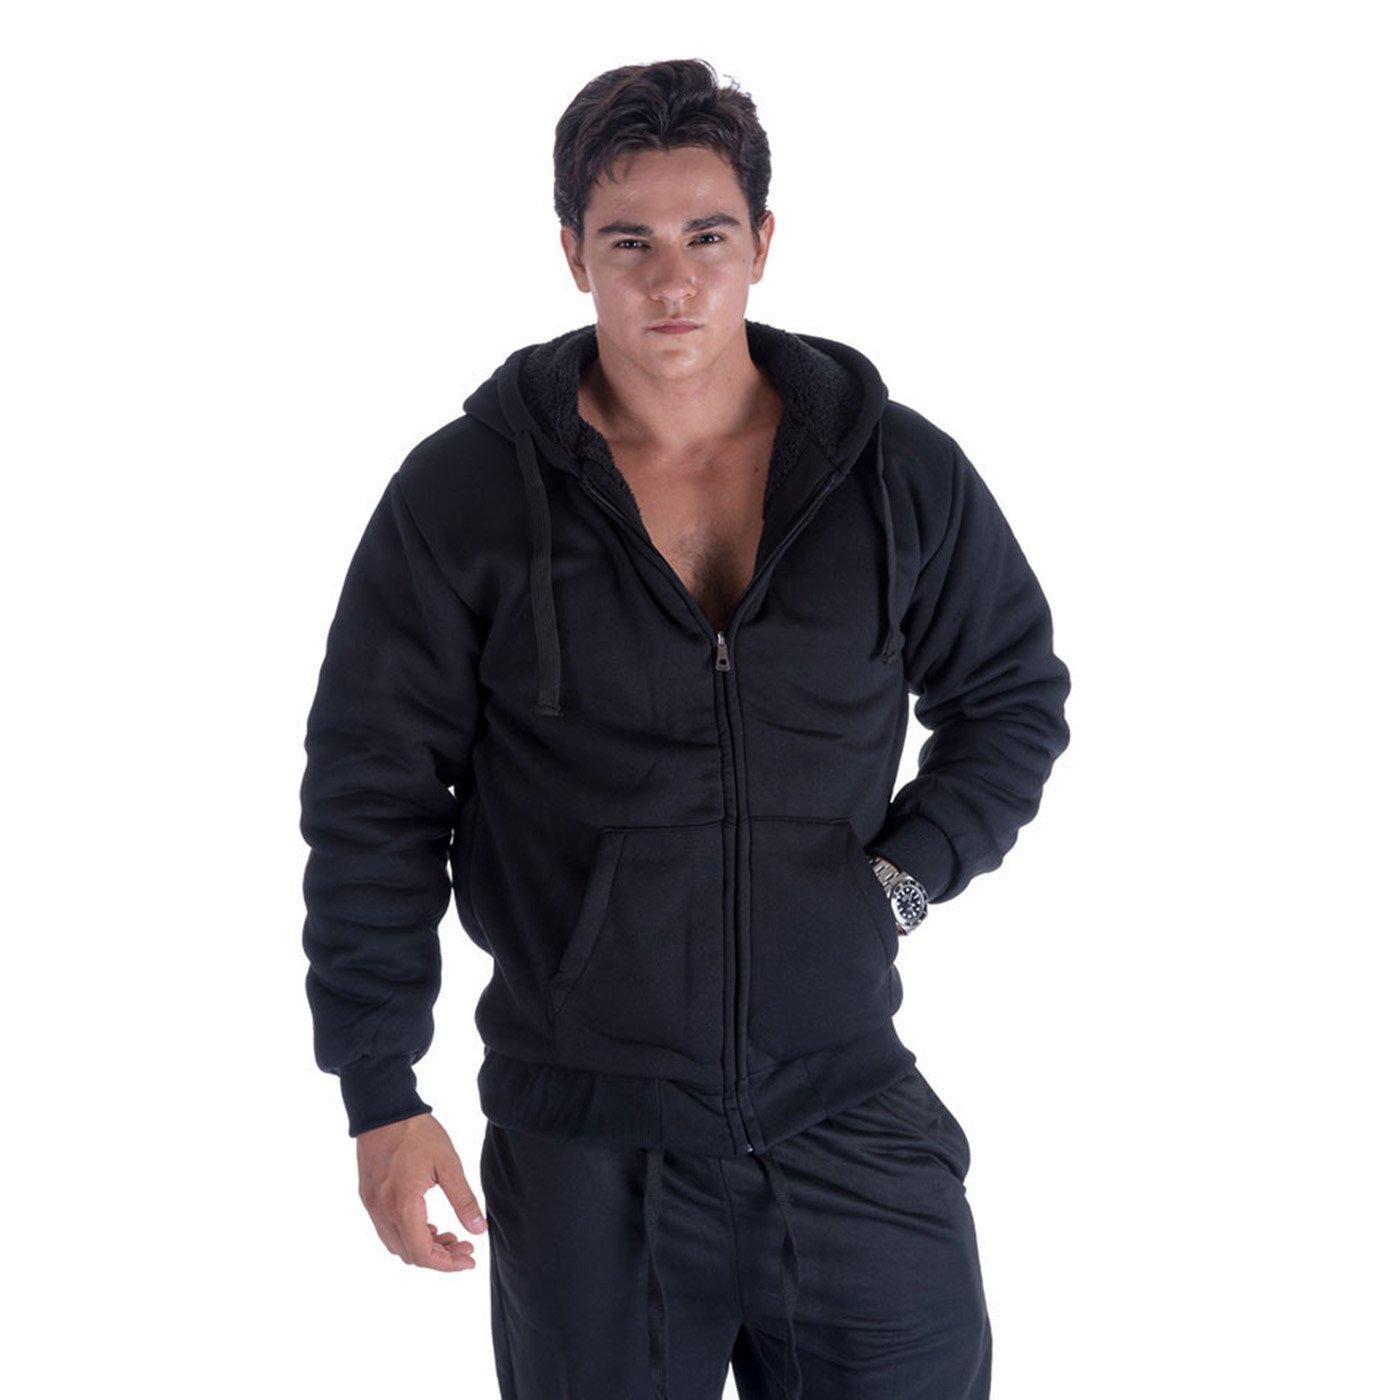 Erin Garments Mens Zip Front Hoodie Oversized Heavyheight Sherpa Lined Sweatshirt Black Grey Long Sleeve Jacket (5X-Large, Black)